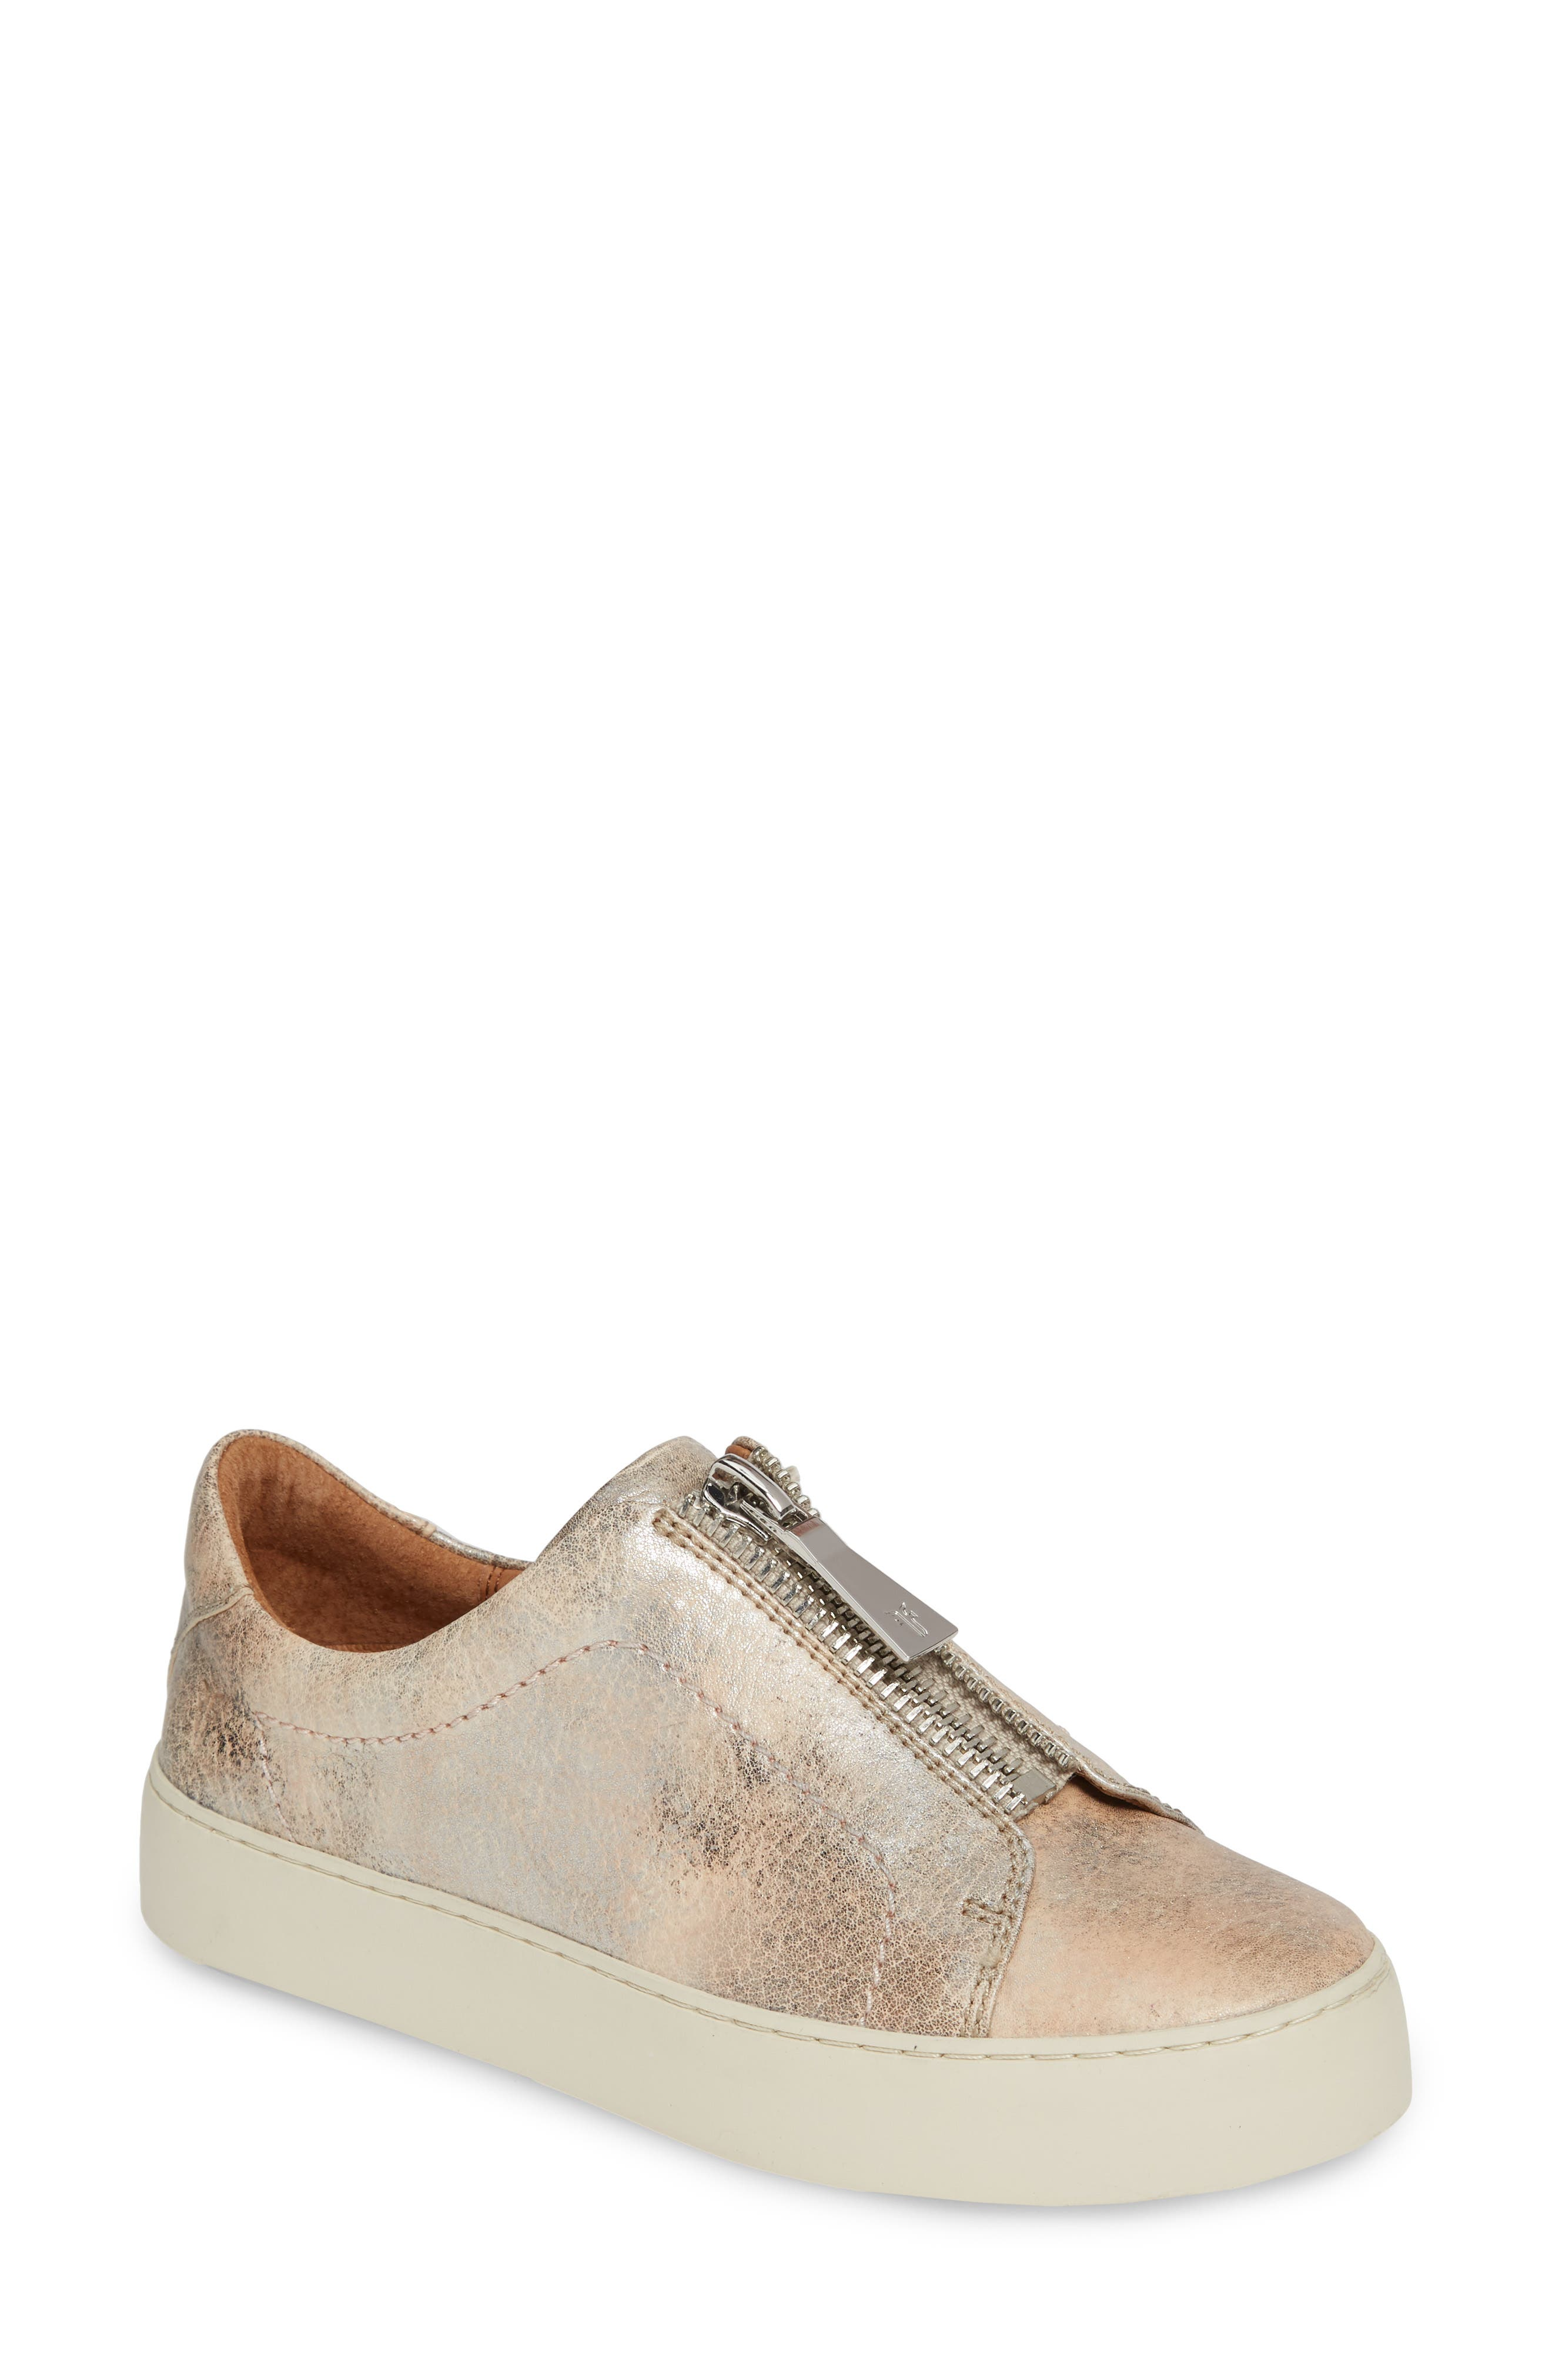 Women's Frye Sneakers \u0026 Athletic: Sale